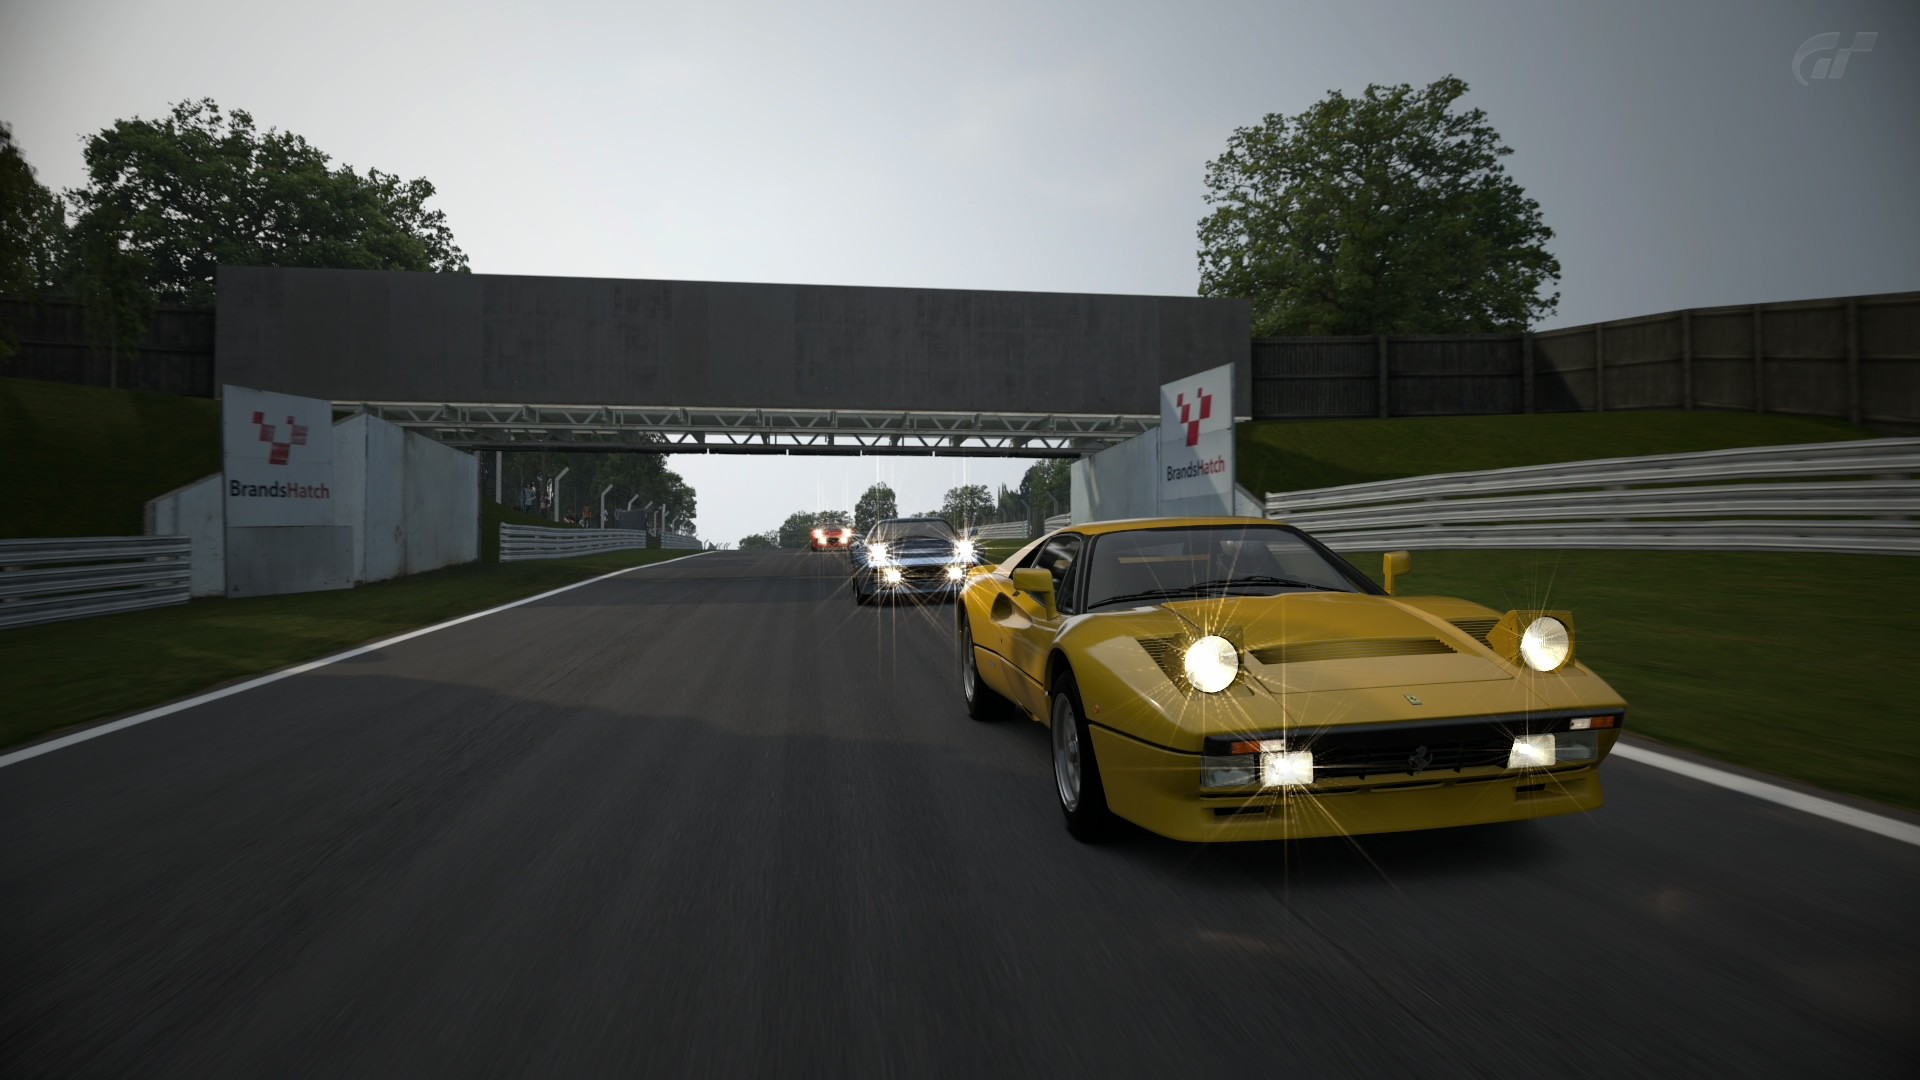 Crónica del Ferrari GTO en Brands Hatch Brands27